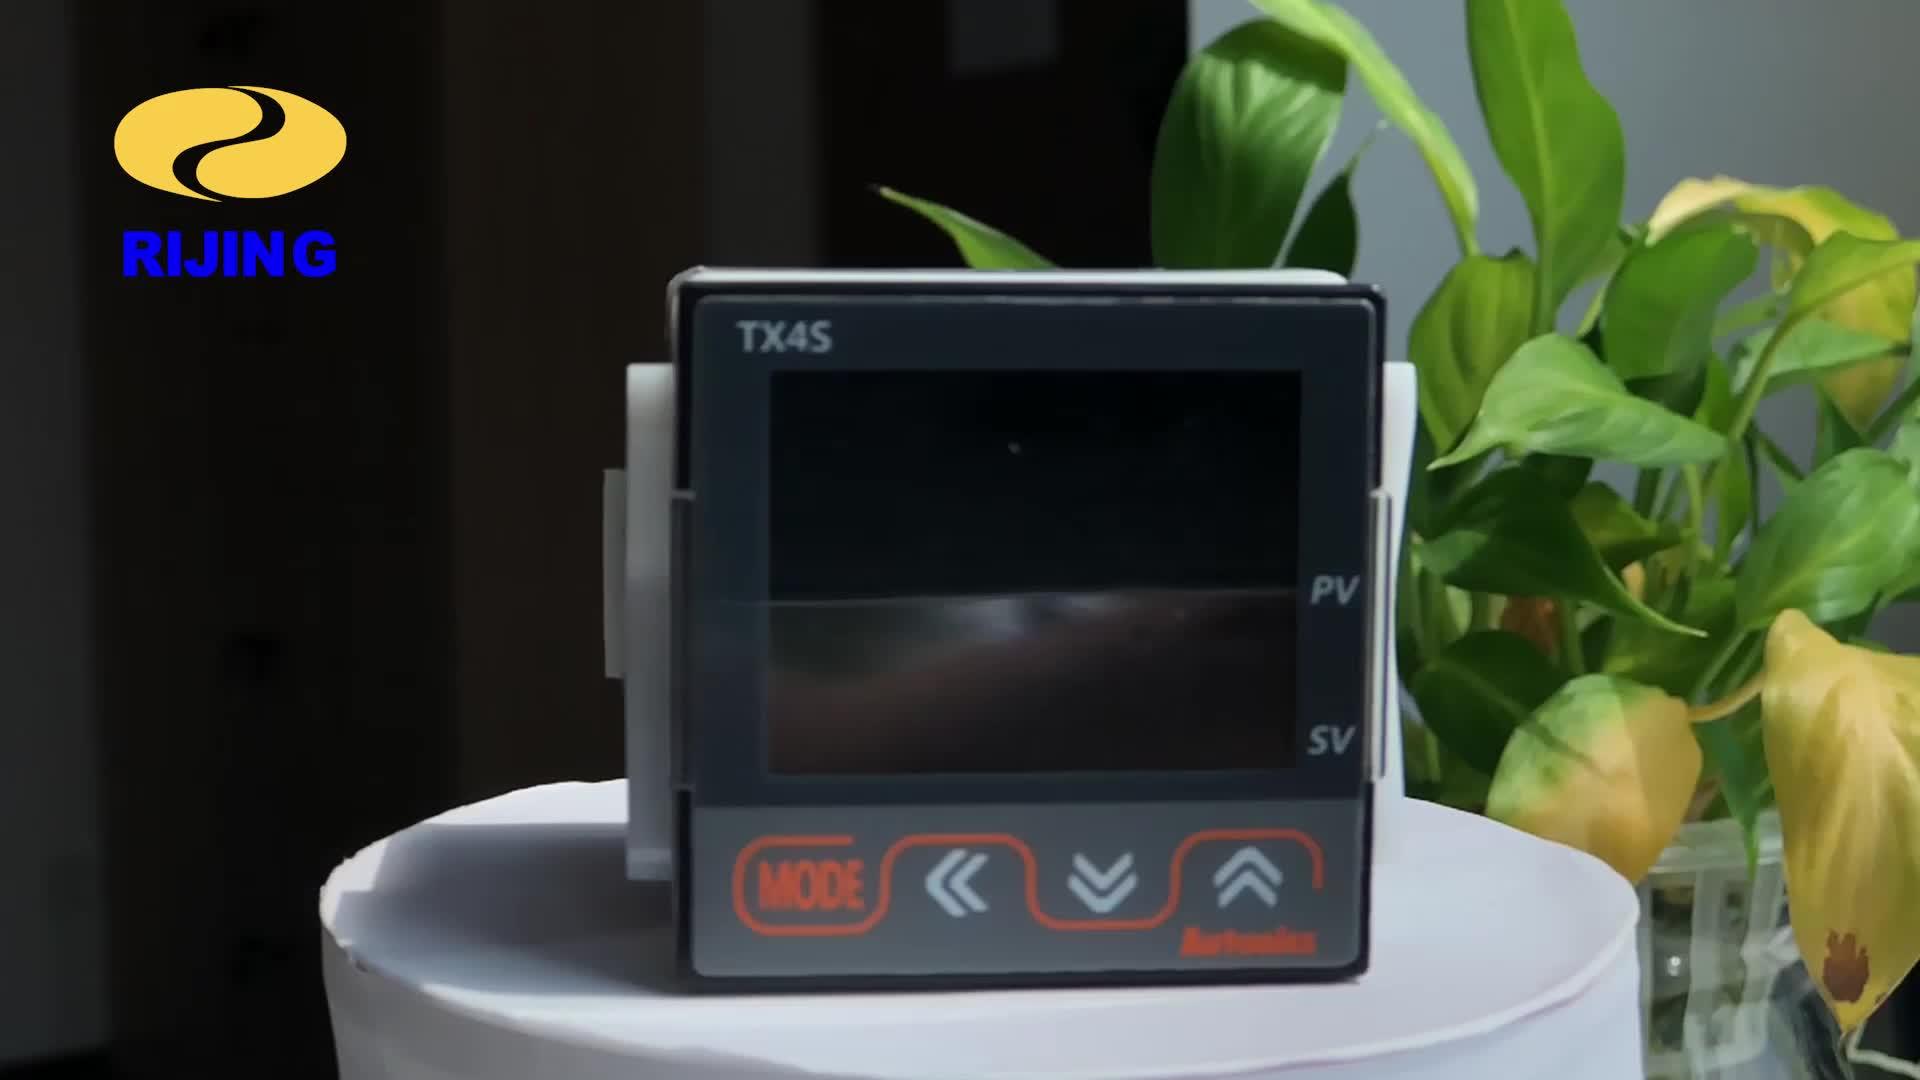 Autonics TX4S-B4R RS485 Modbus PID LCD Display Temperature Controller